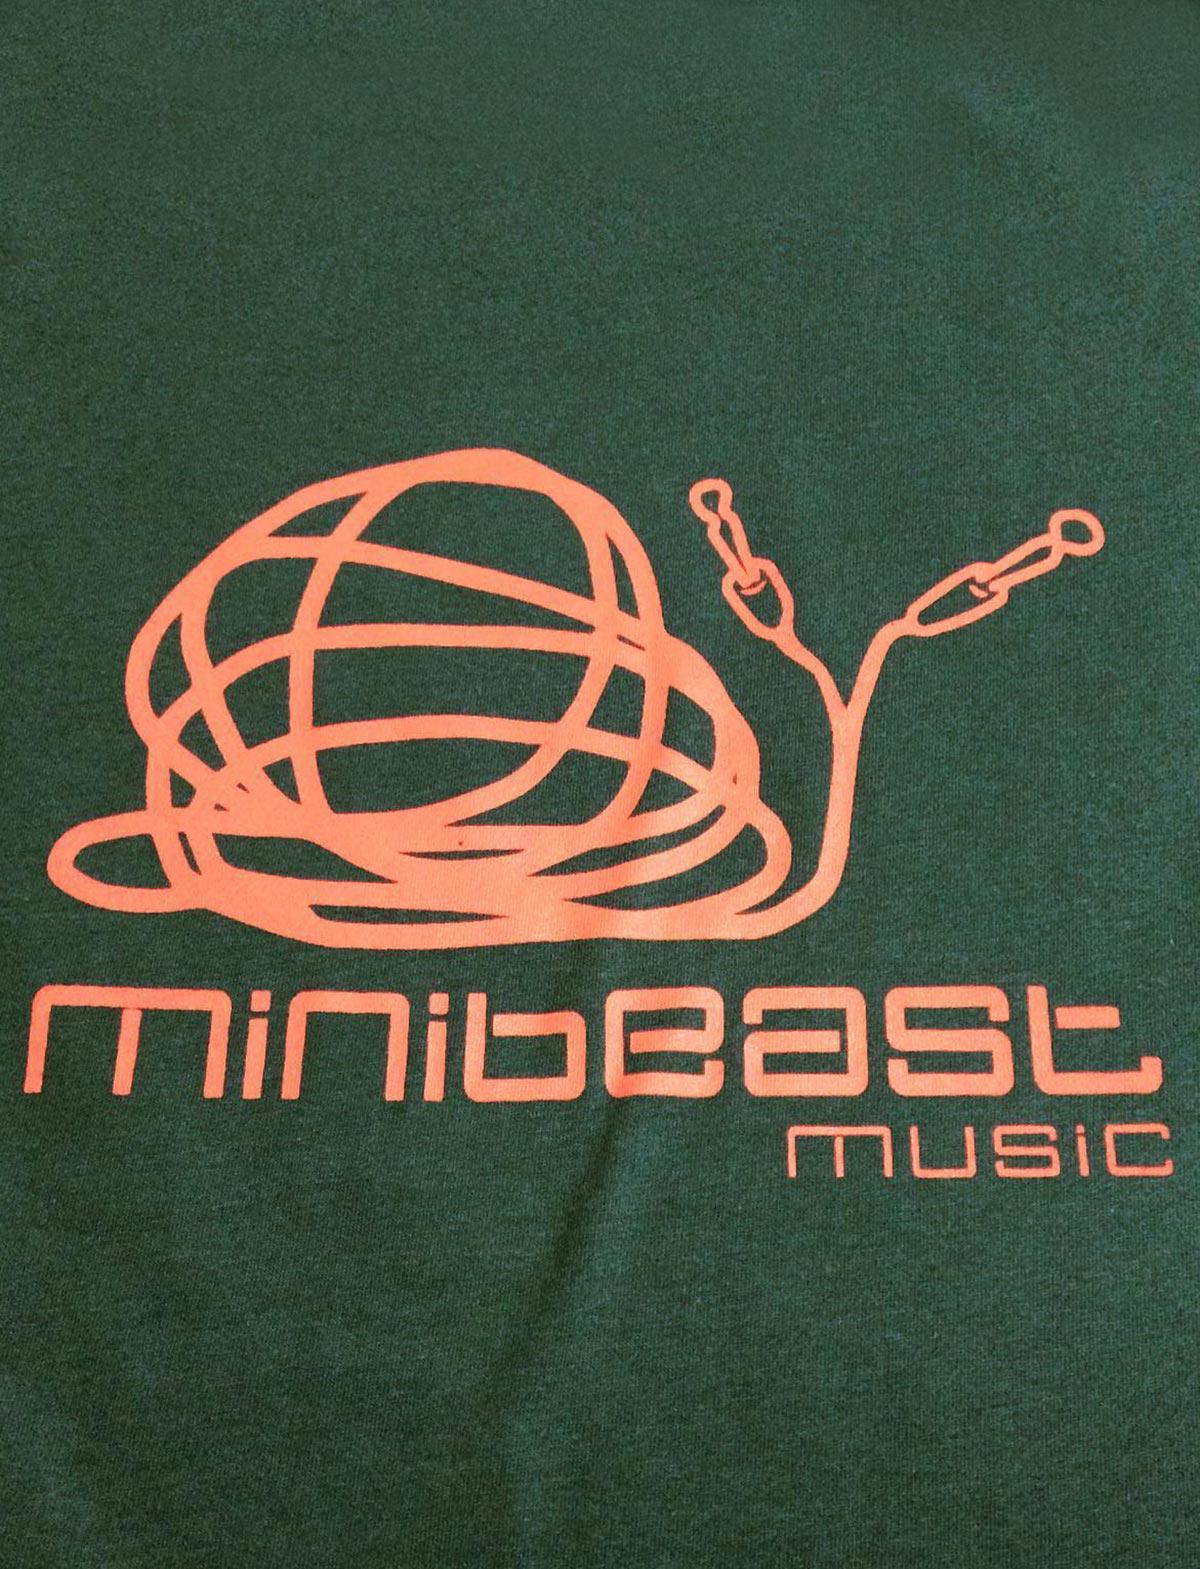 minibeast music studio, organic green t-shirt